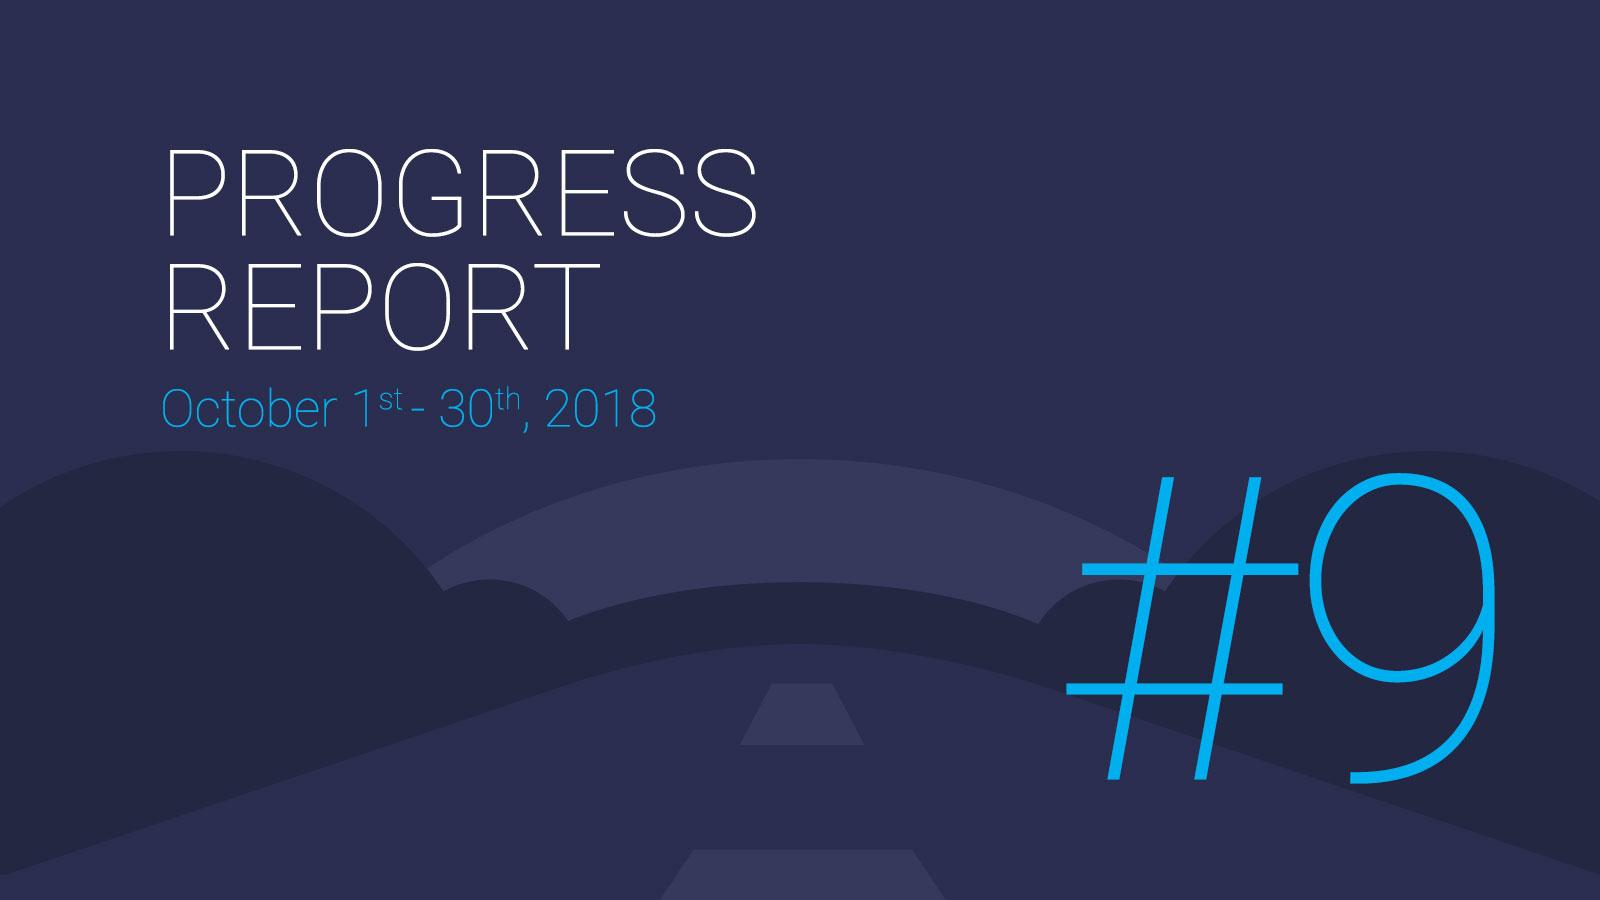 Carco progress report November 2018